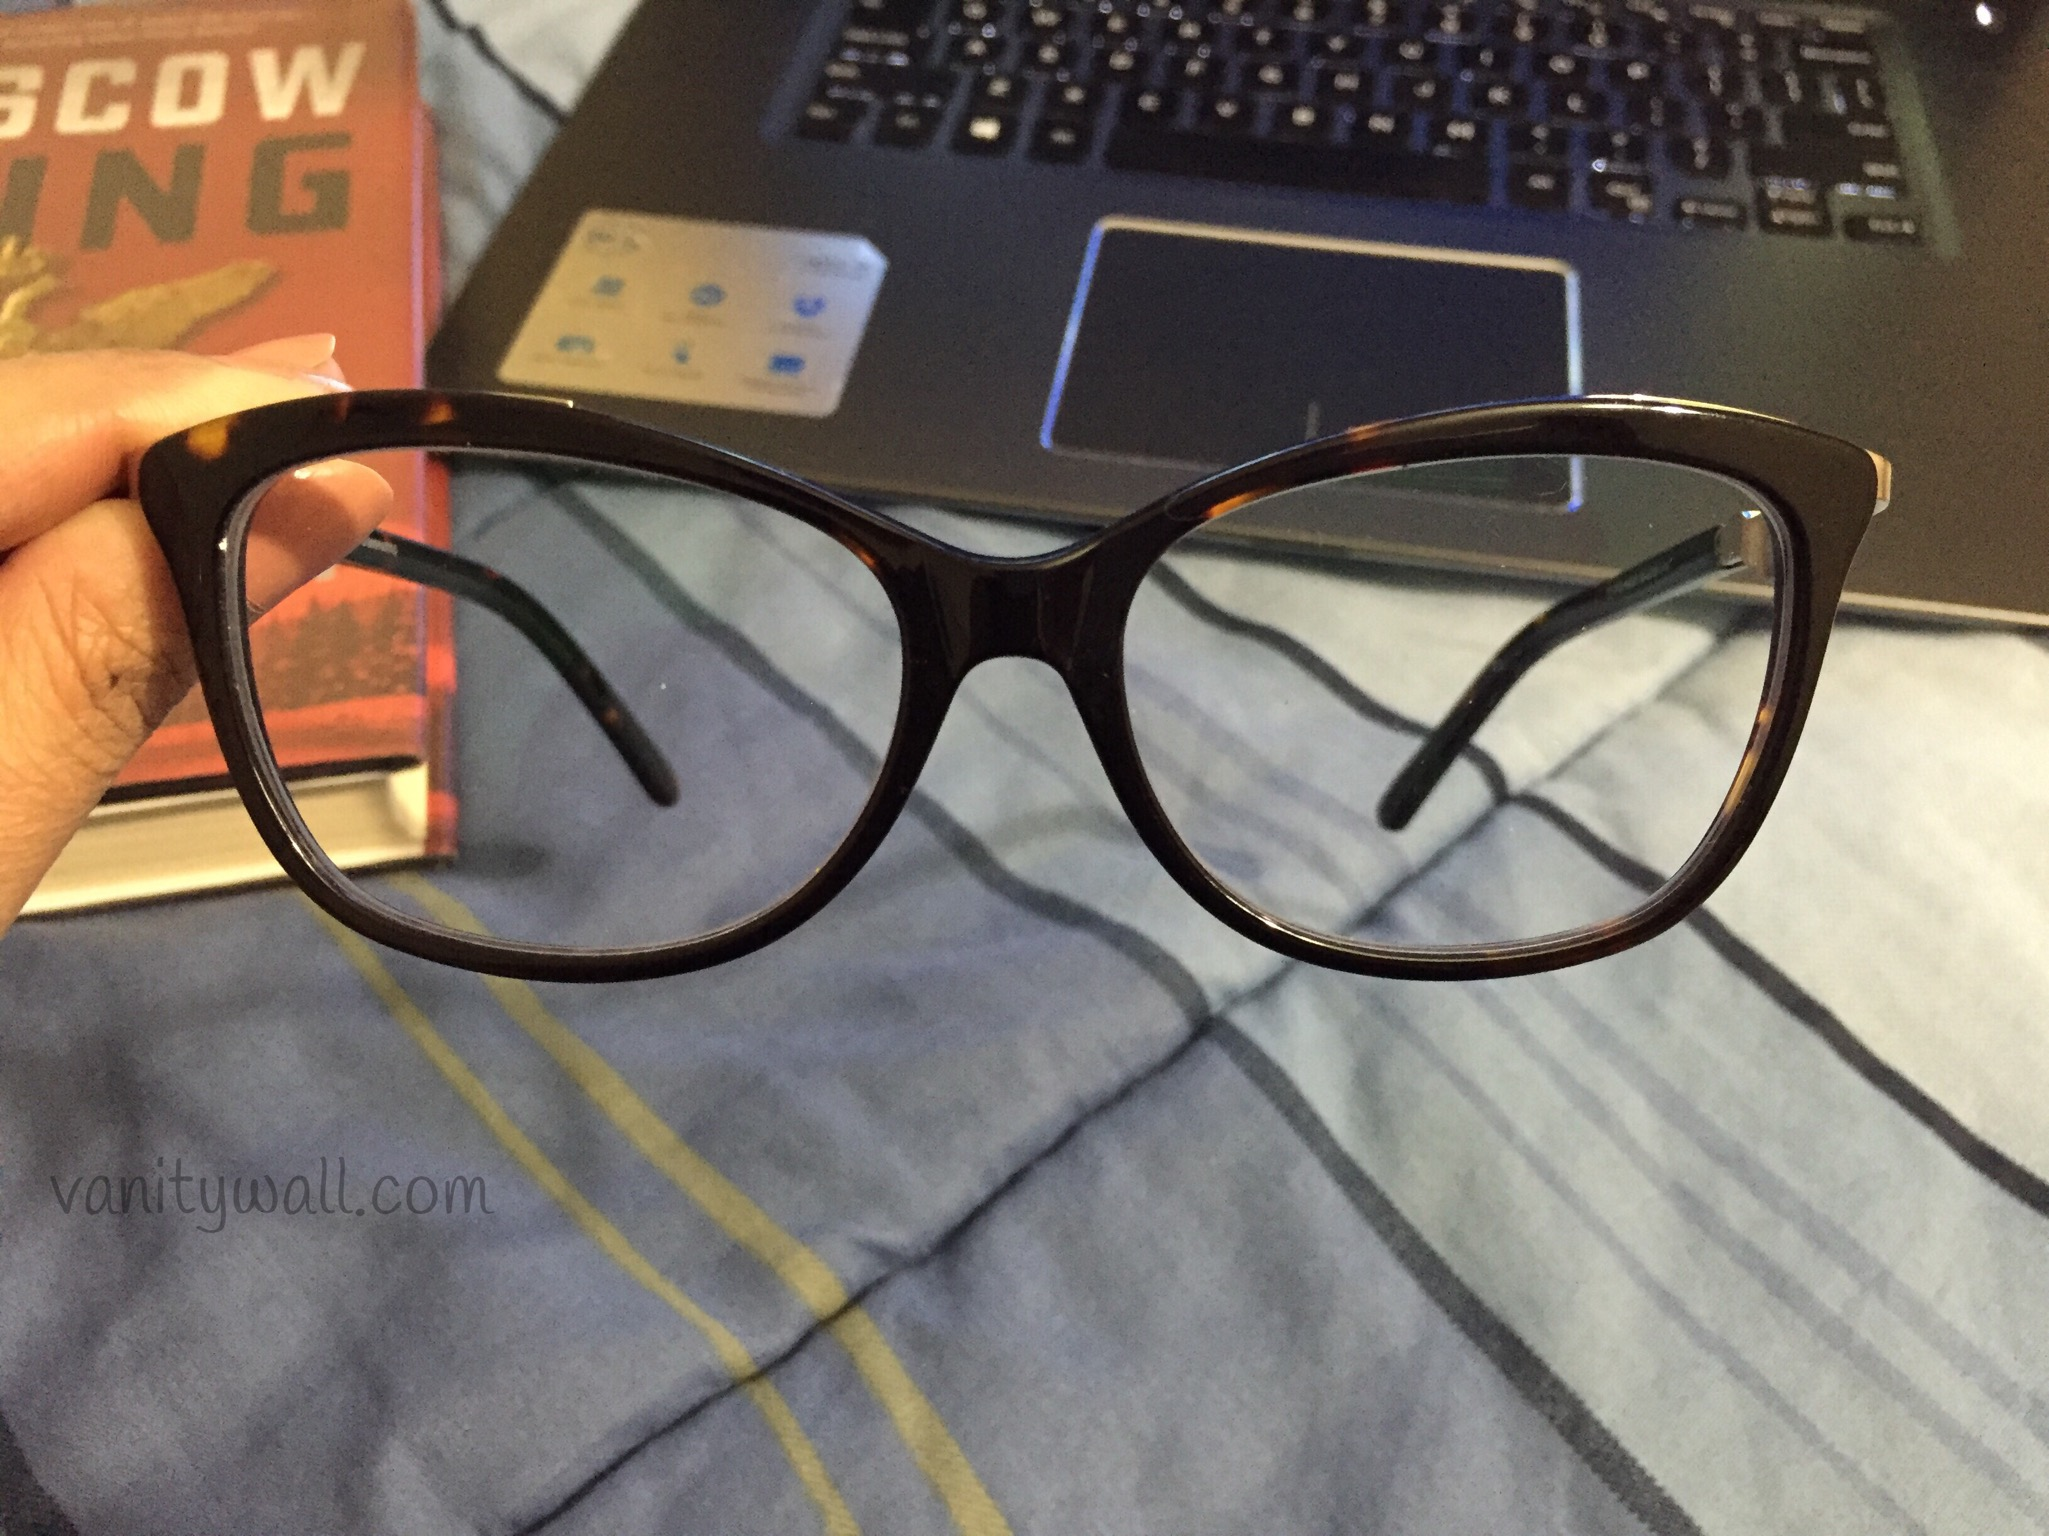 glassesshop eyewear